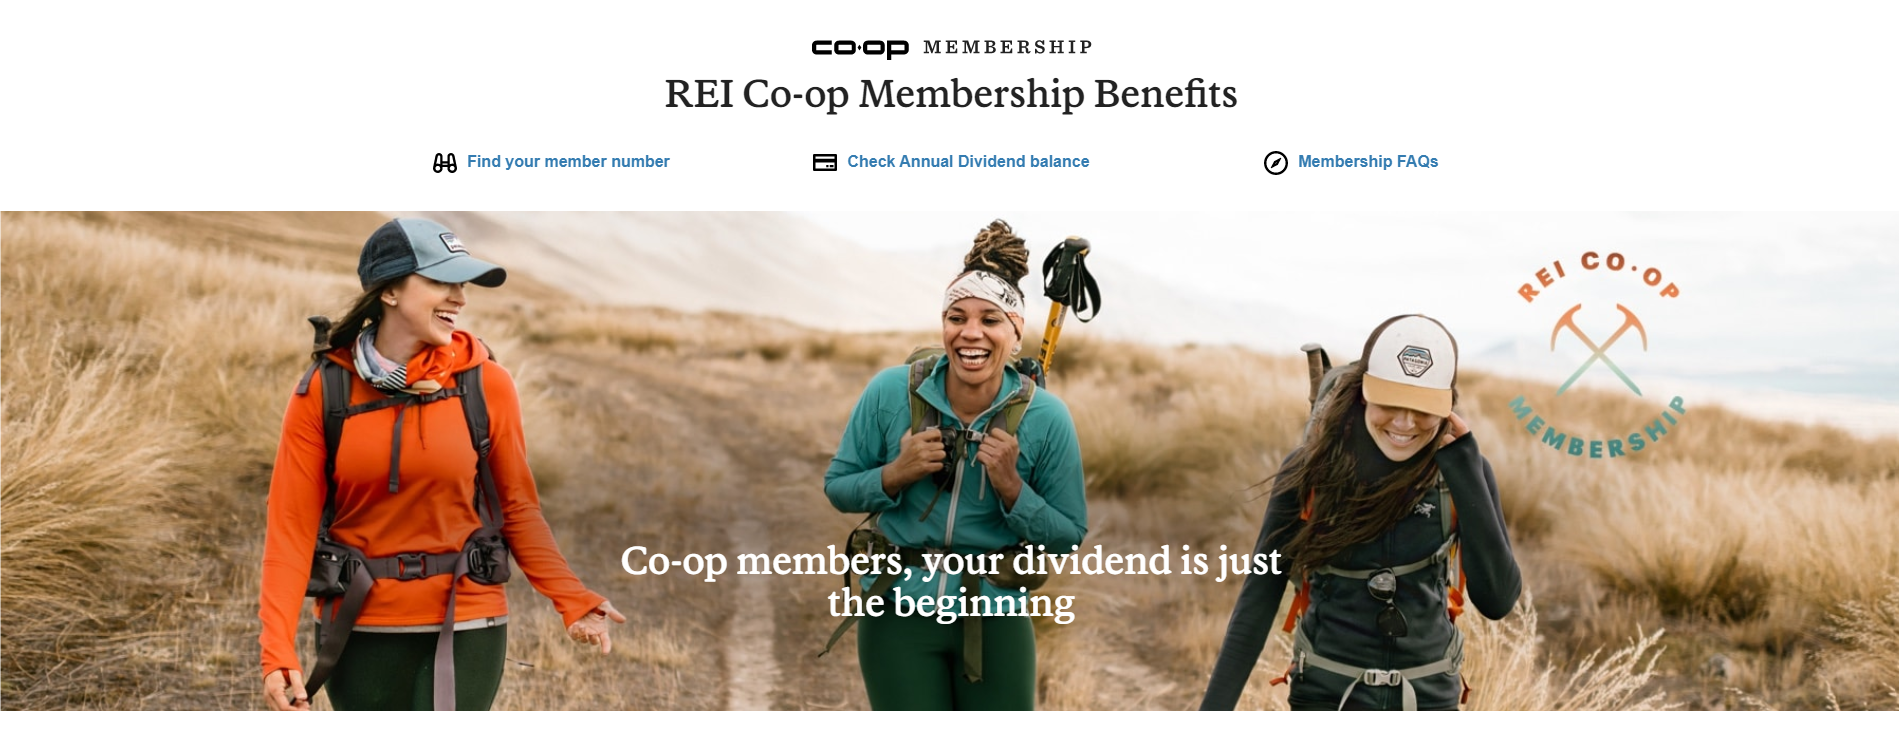 rei-coop-membership